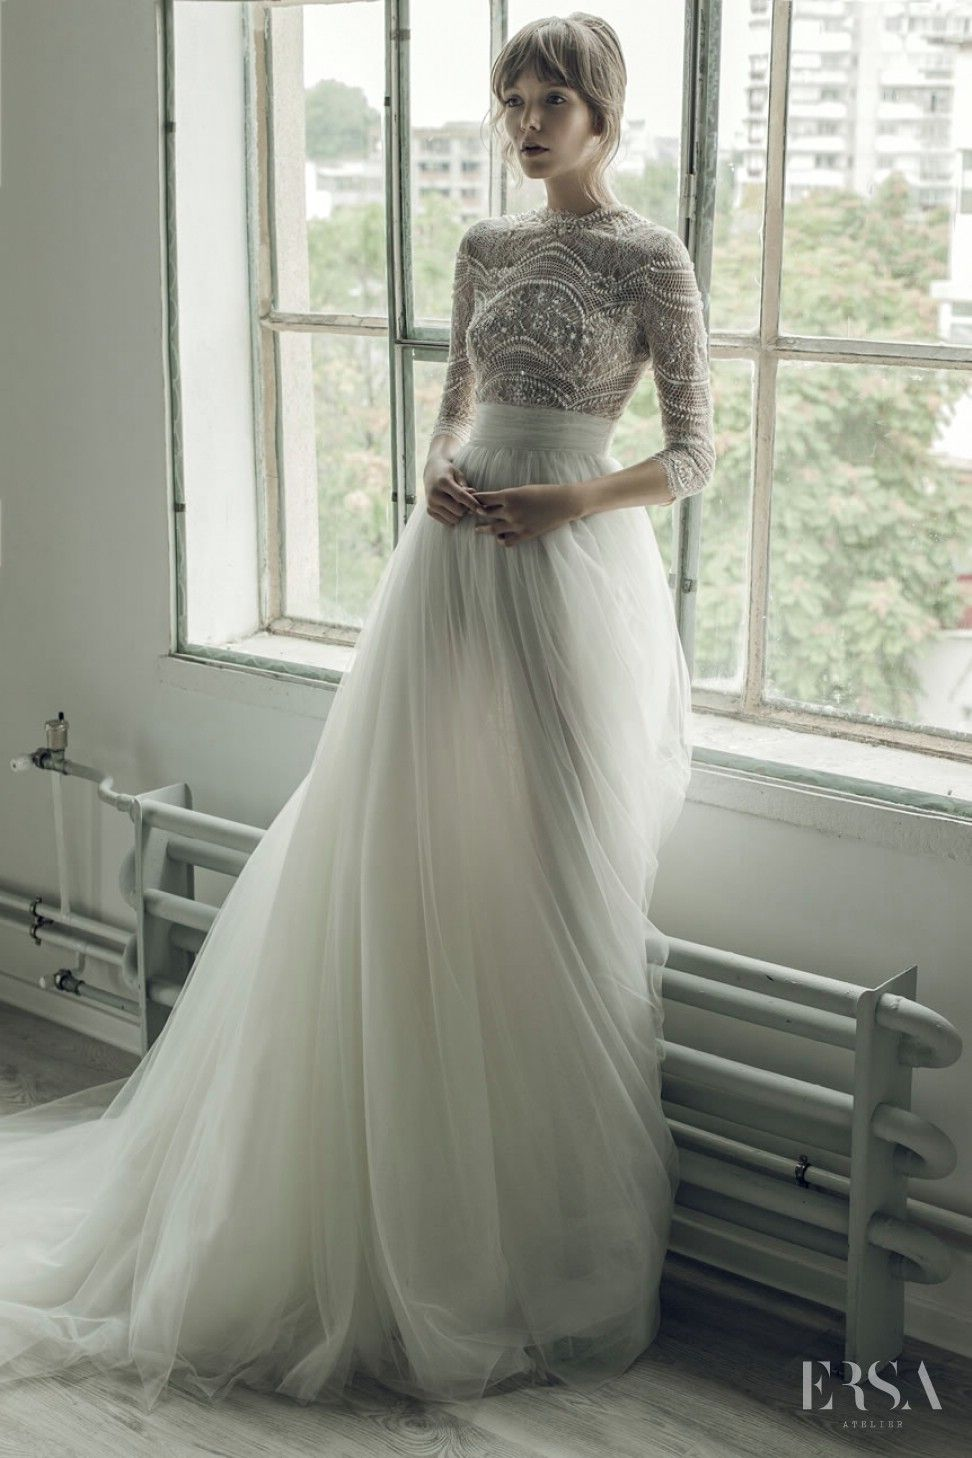 99ae4694ed65 Ersa Atelier - Wedding Collection- Evening dress Serena